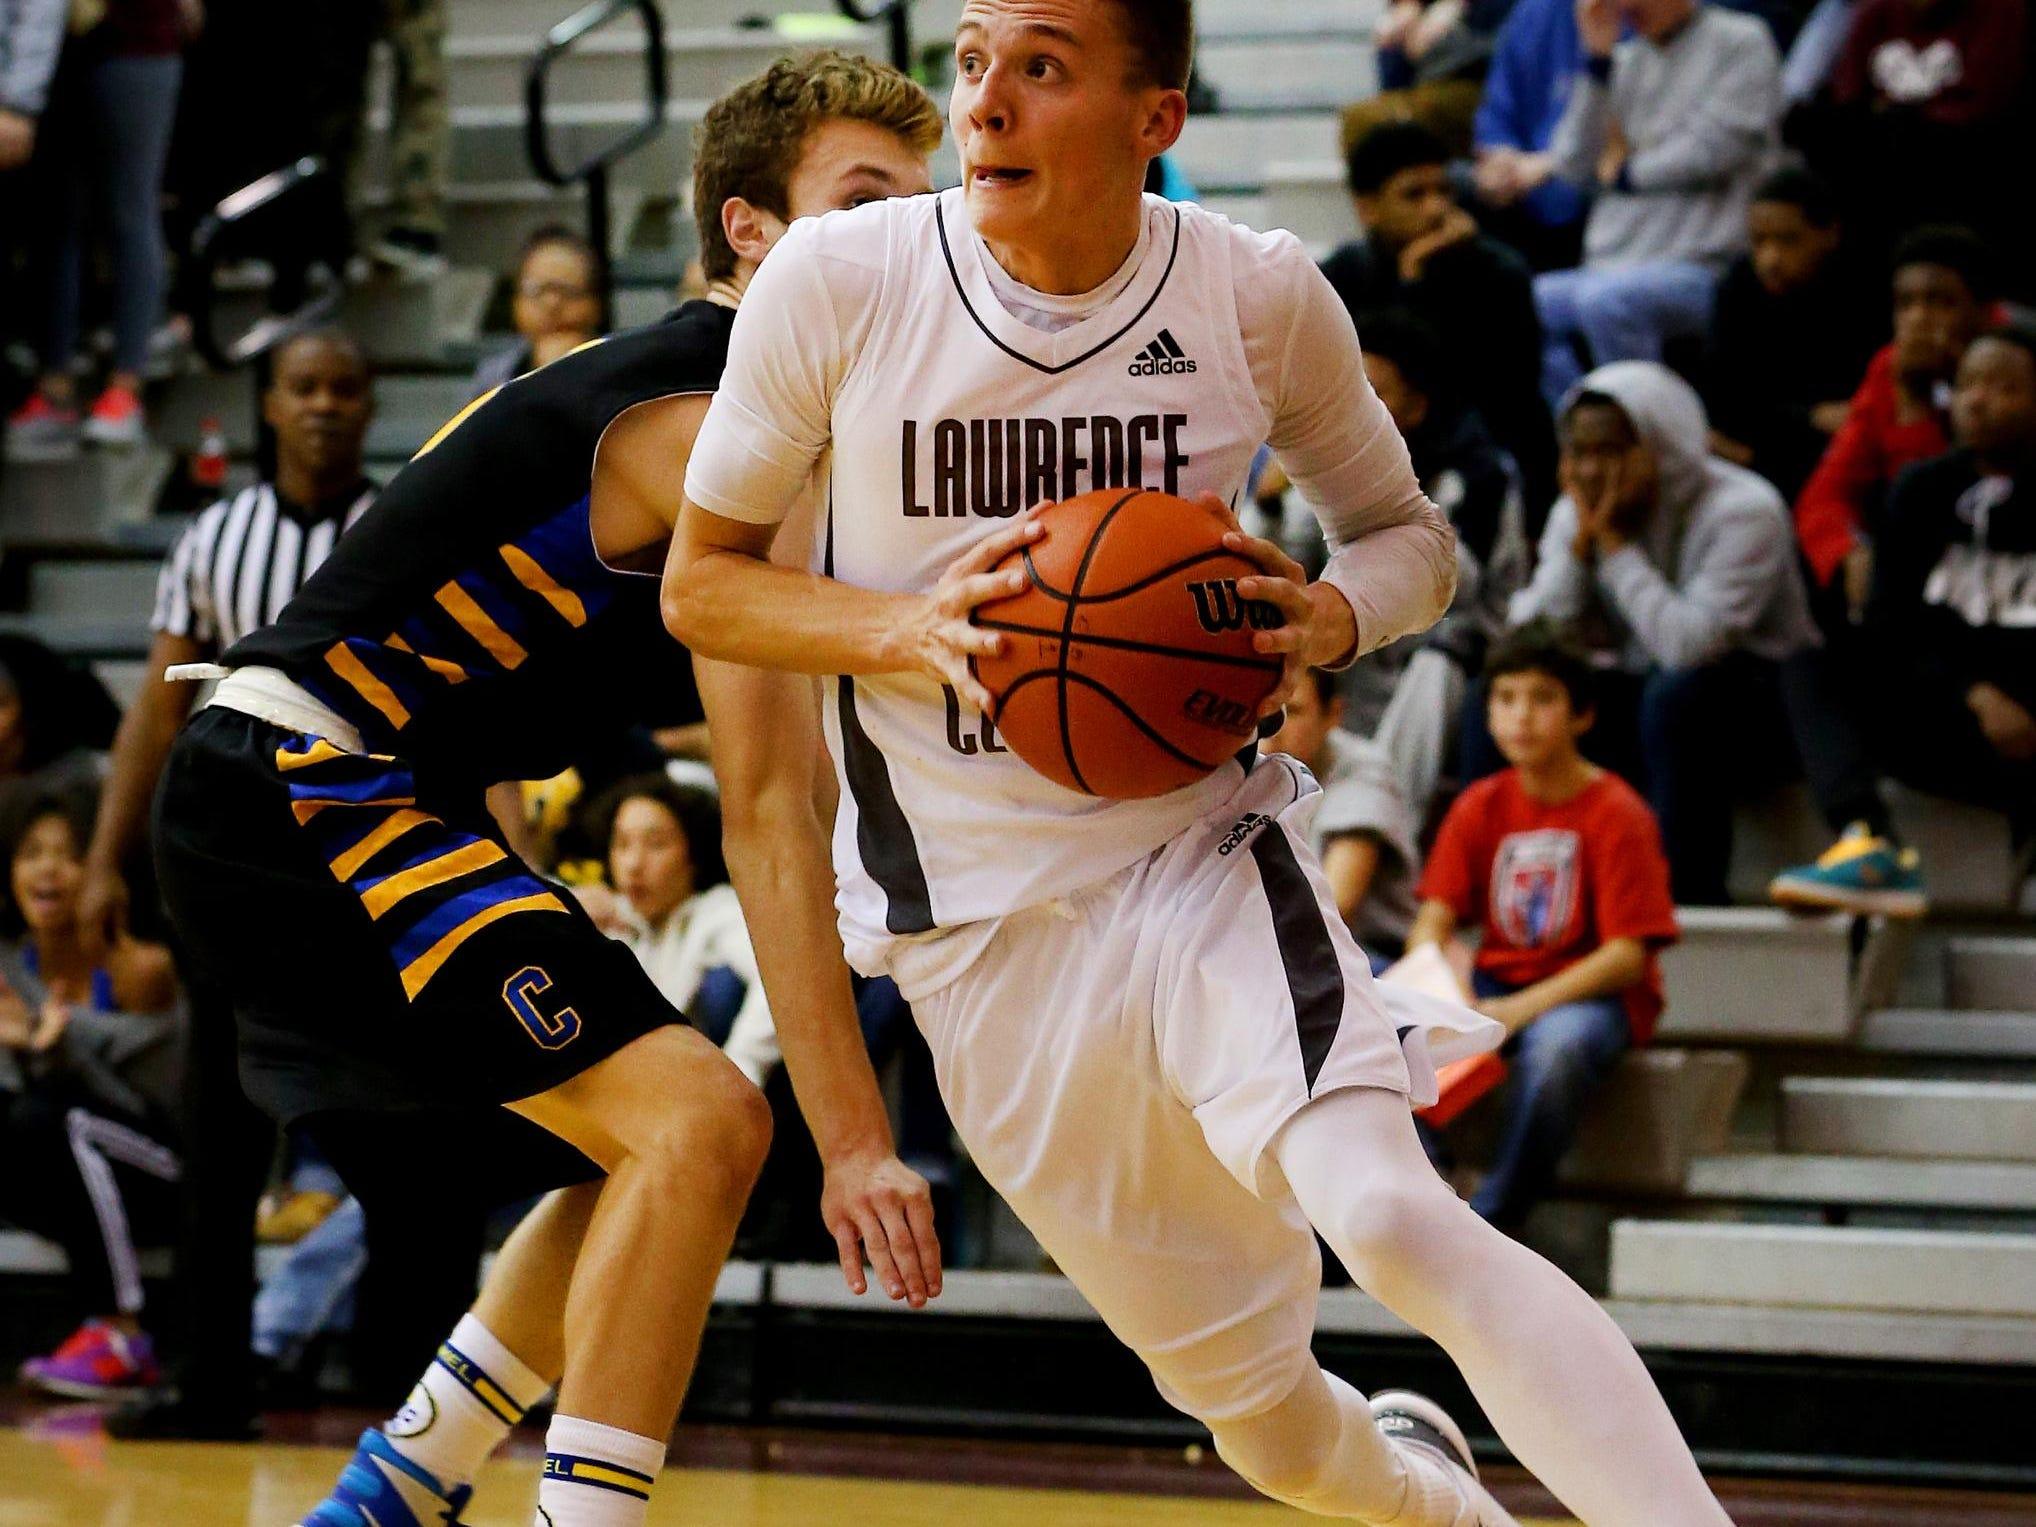 Lawrence Central's Kyle Guy (24) drives the baseline against Carmel on Dec. 4, 2015.